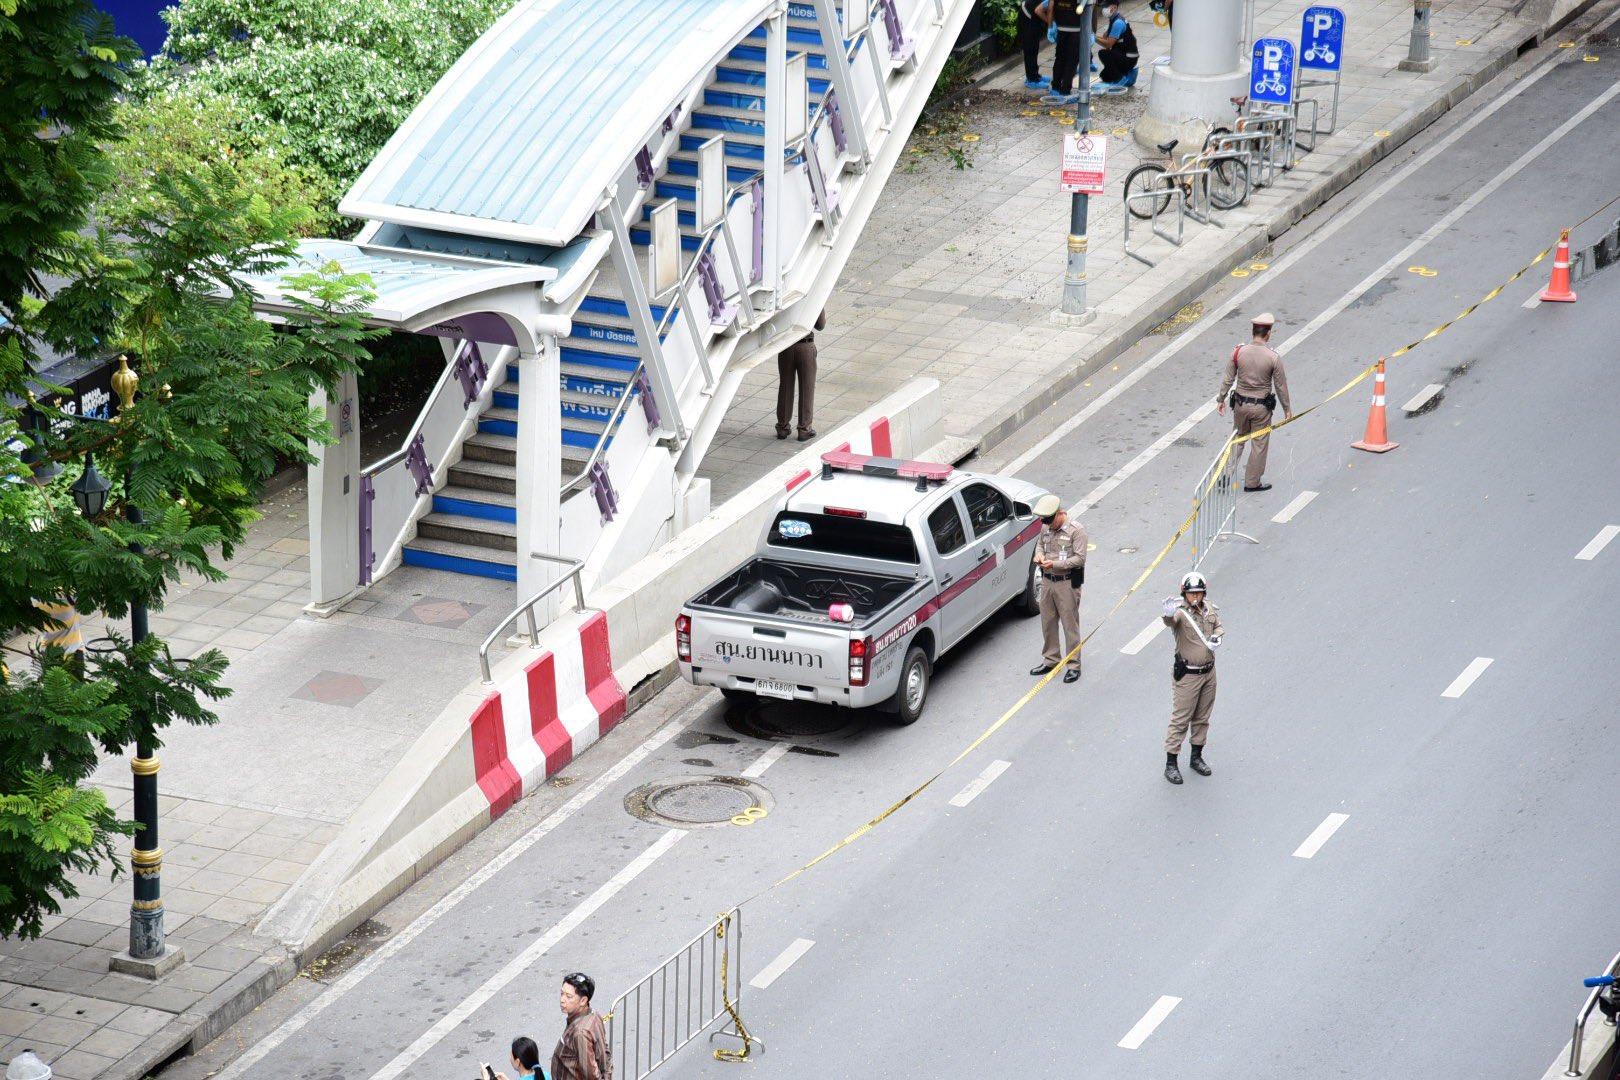 chong_nonsi_bomb_police.jpg